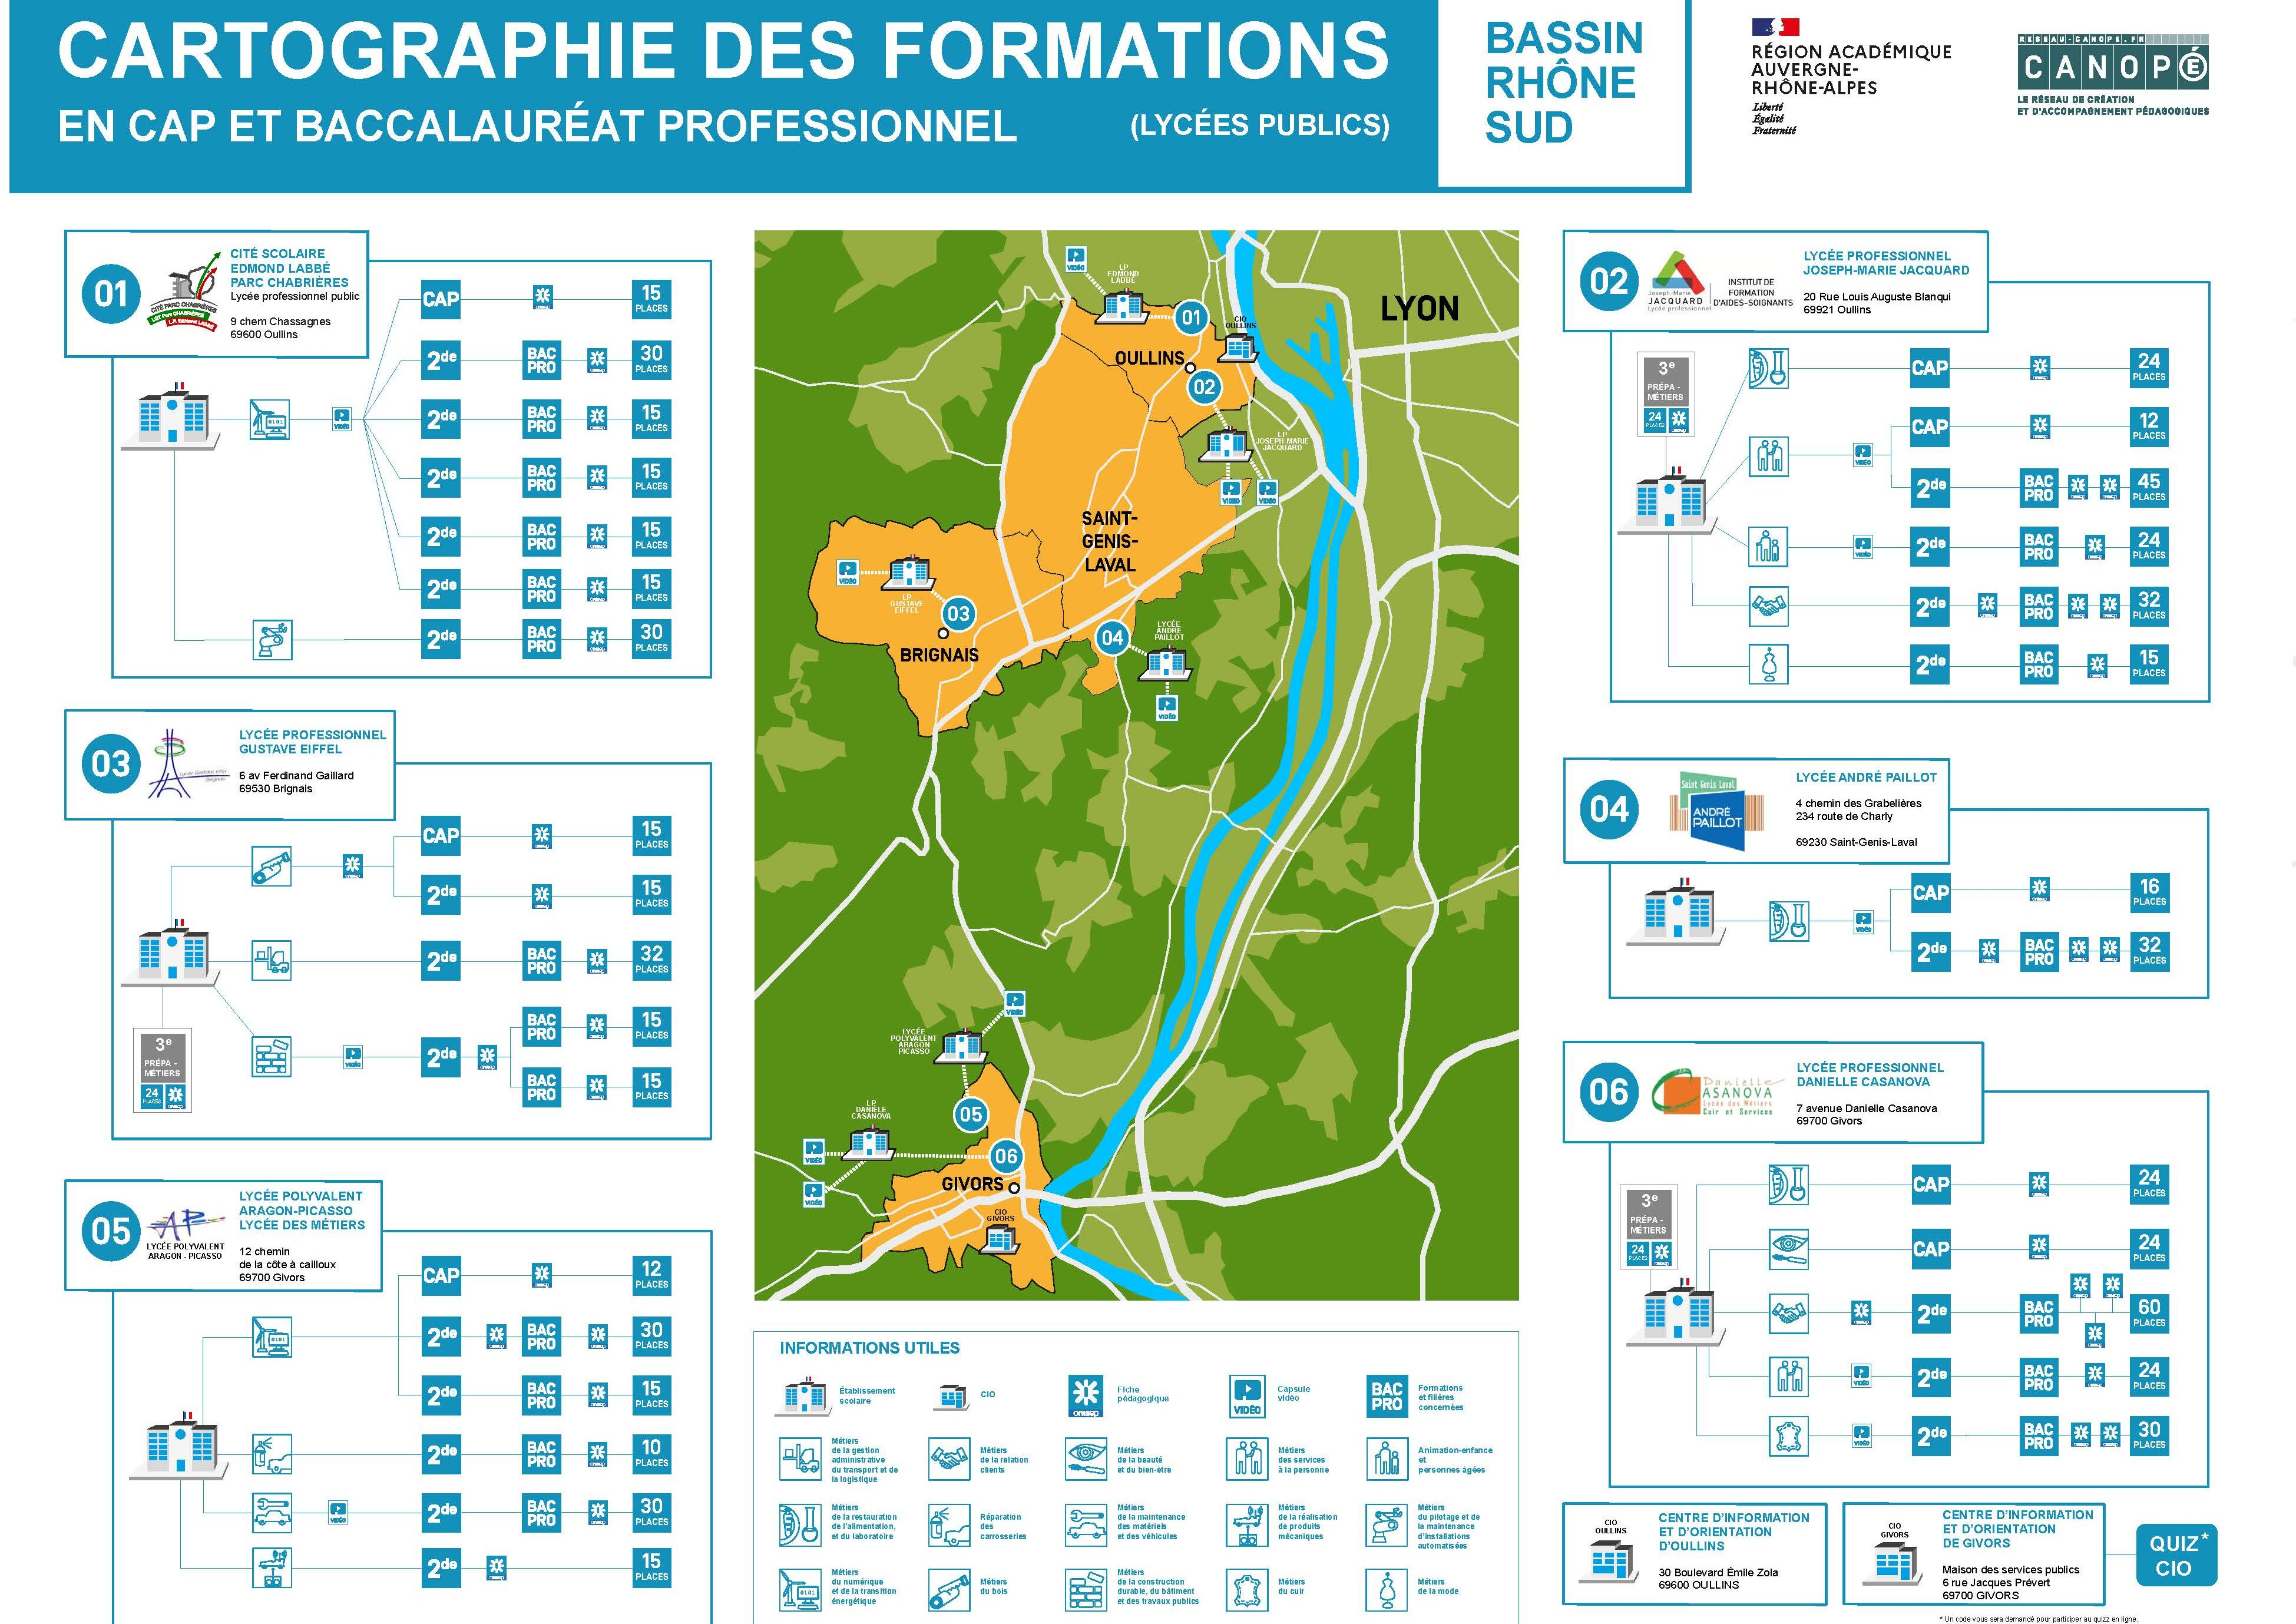 Cartographie des formations Bassin rhone sud mars 2021-1.jpg